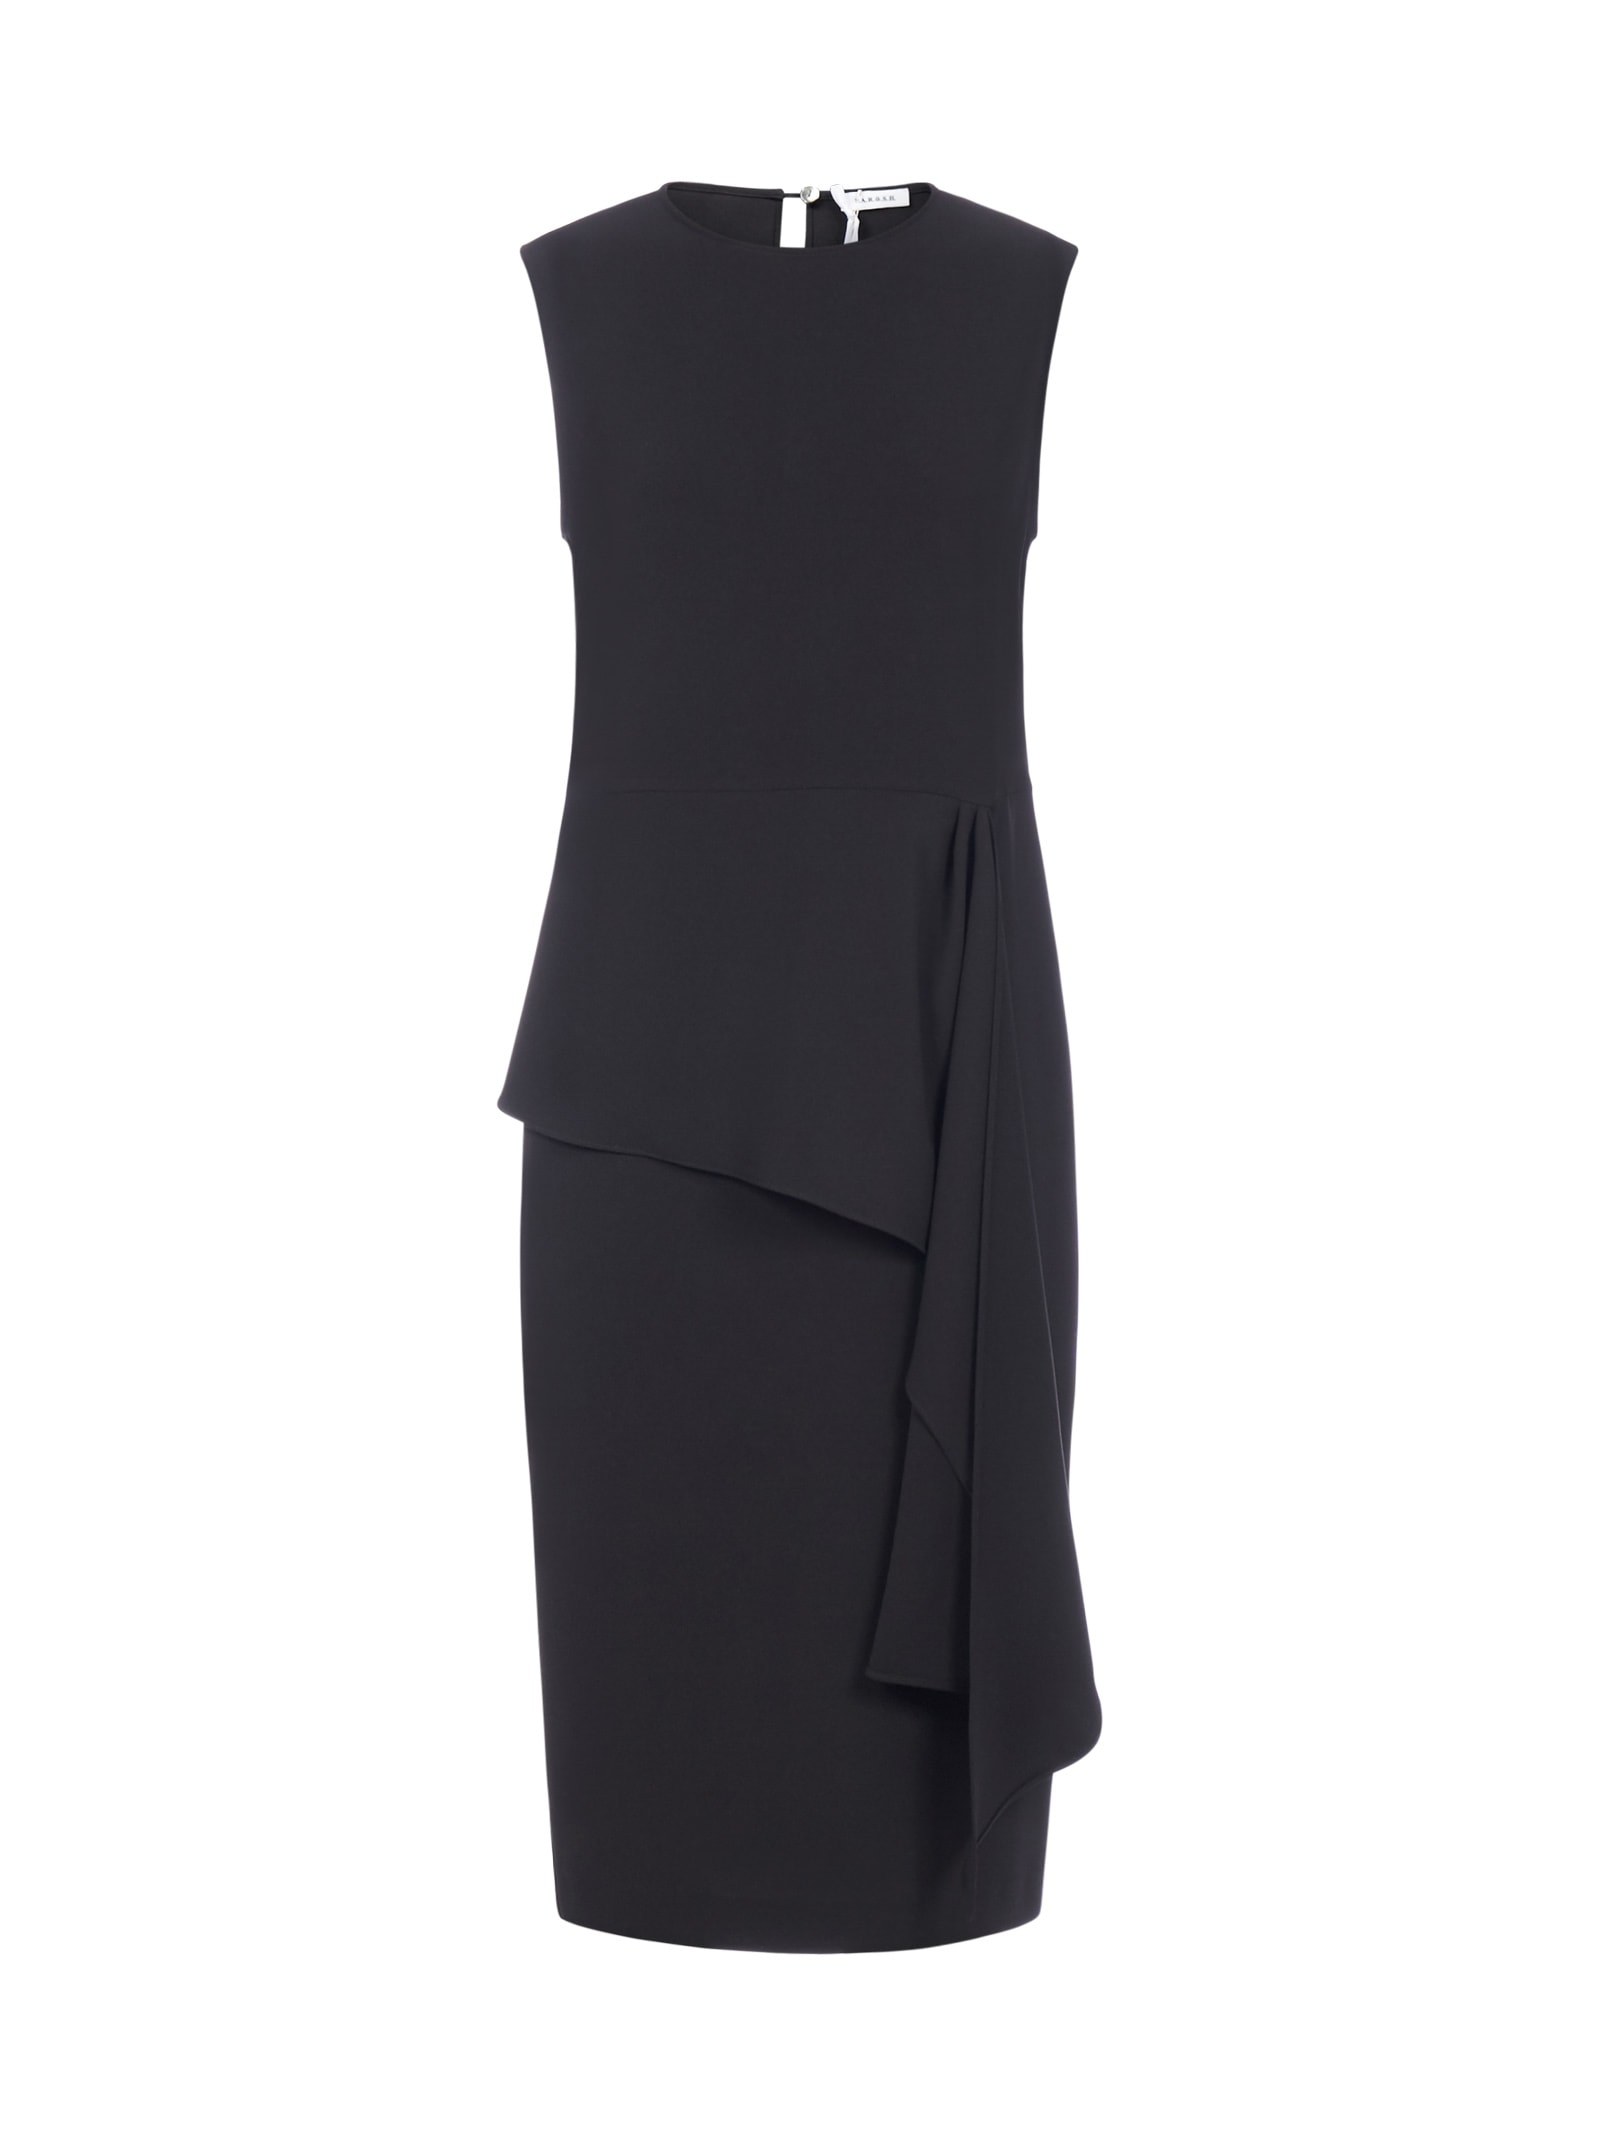 Buy Parosh Pirate Asymmetrical Ruffle Pencil Dress online, shop Parosh with free shipping